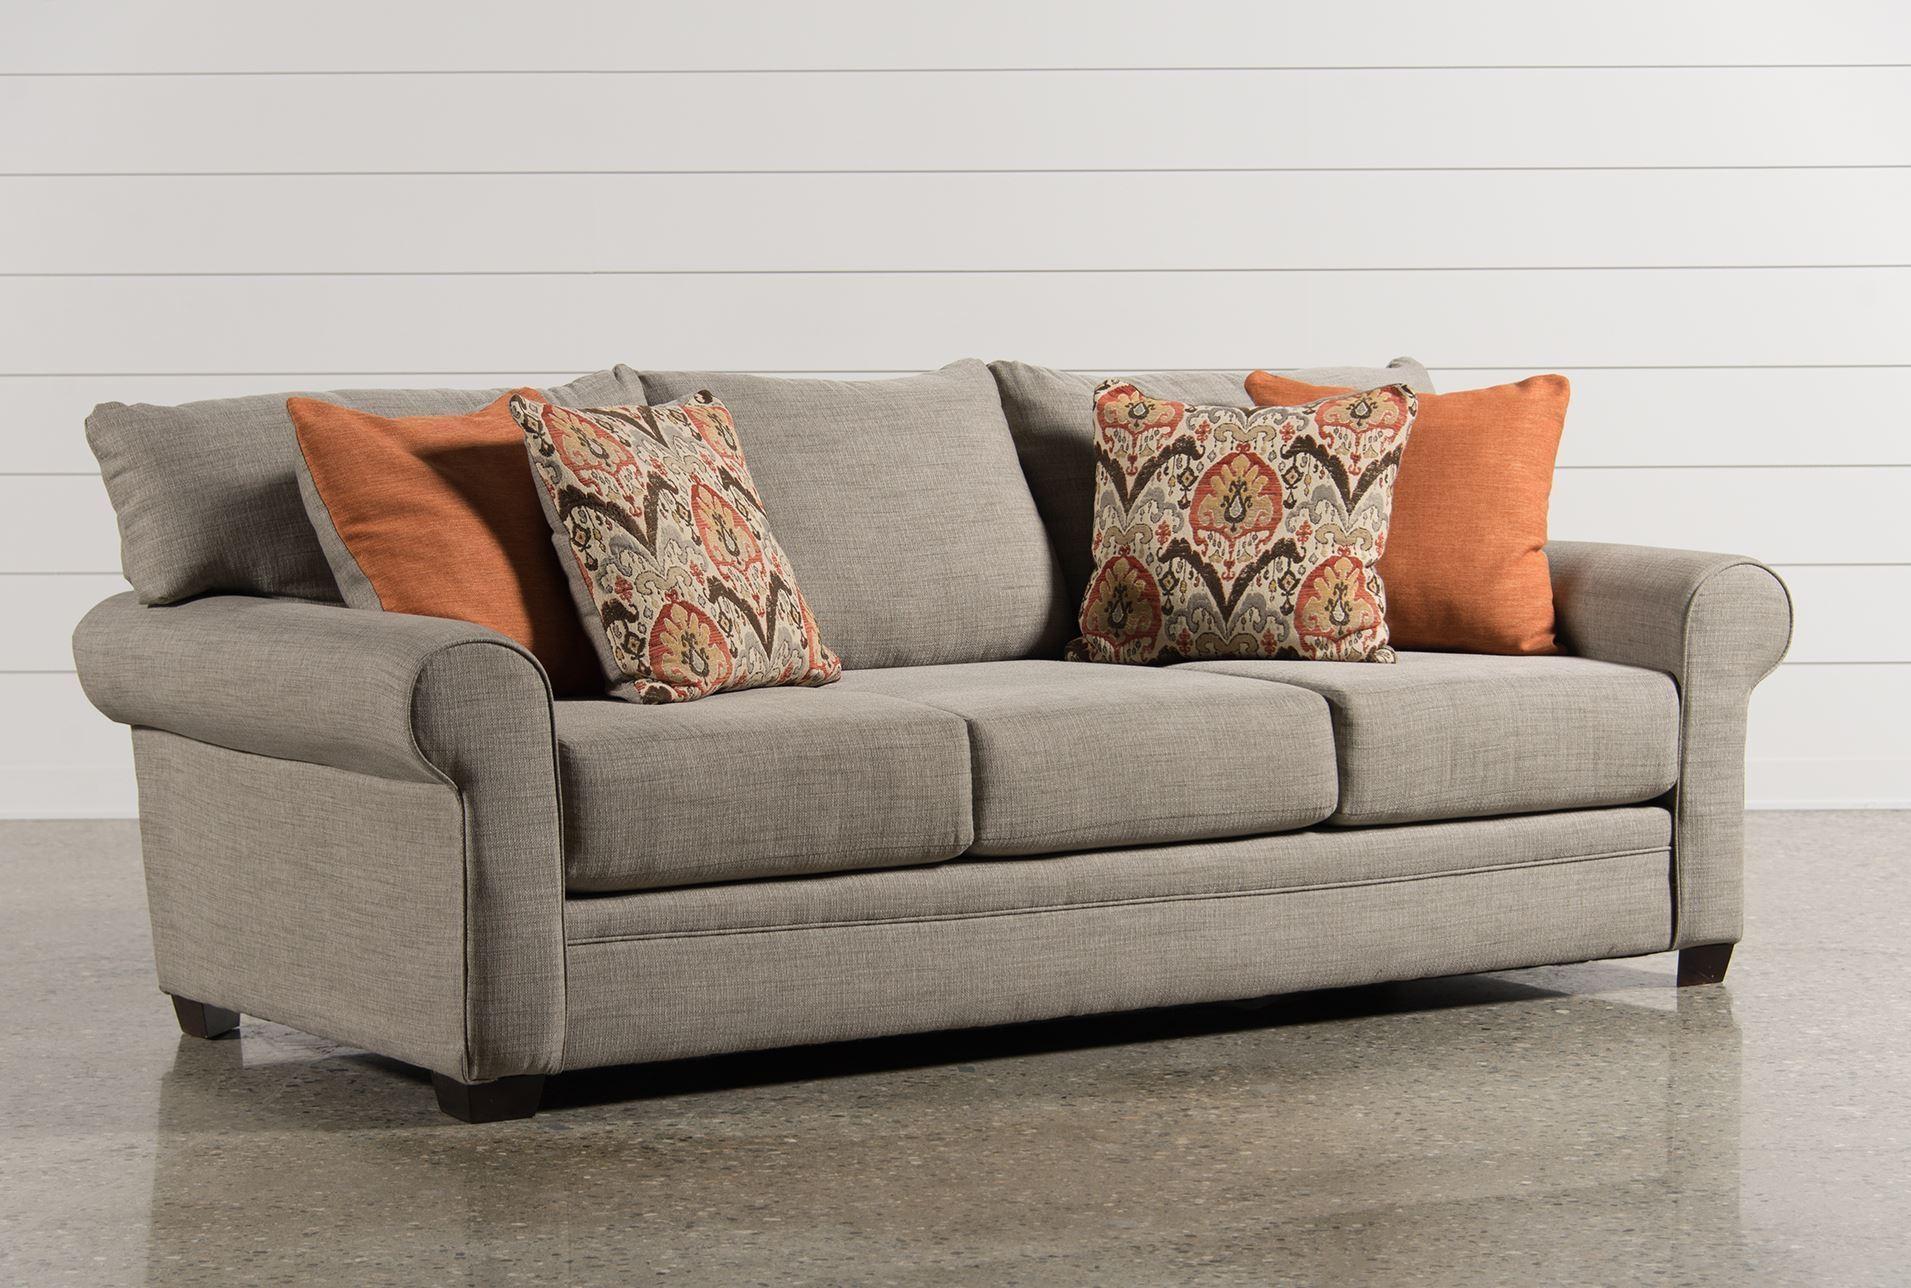 living es sofa contemporary orange sectional pier one sleeper bulgarmark